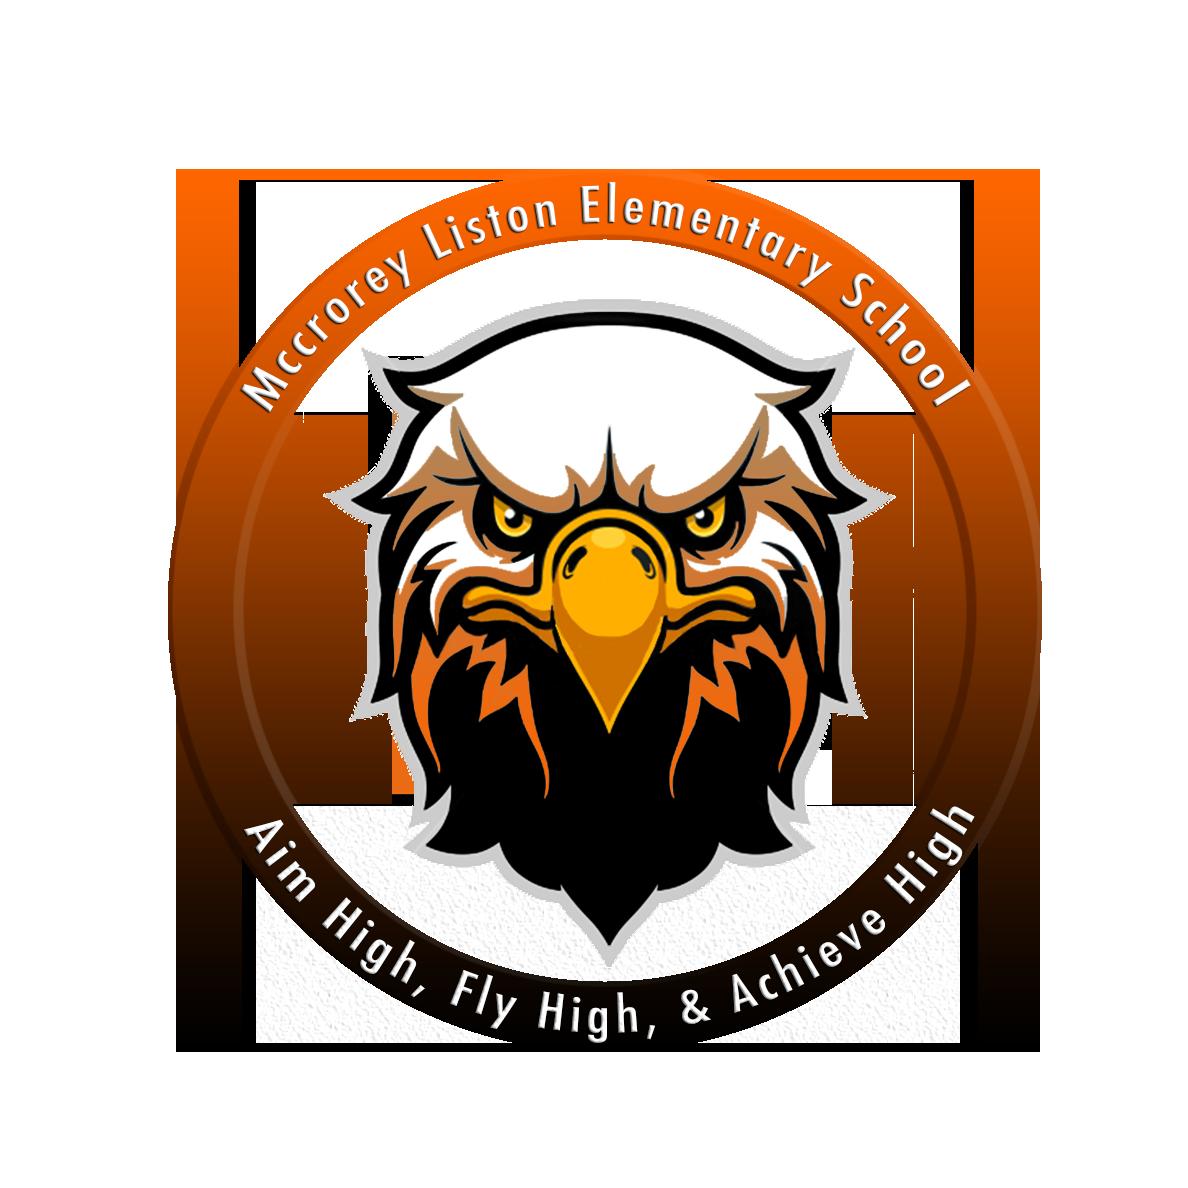 McCorey-Liston Elementary Logo